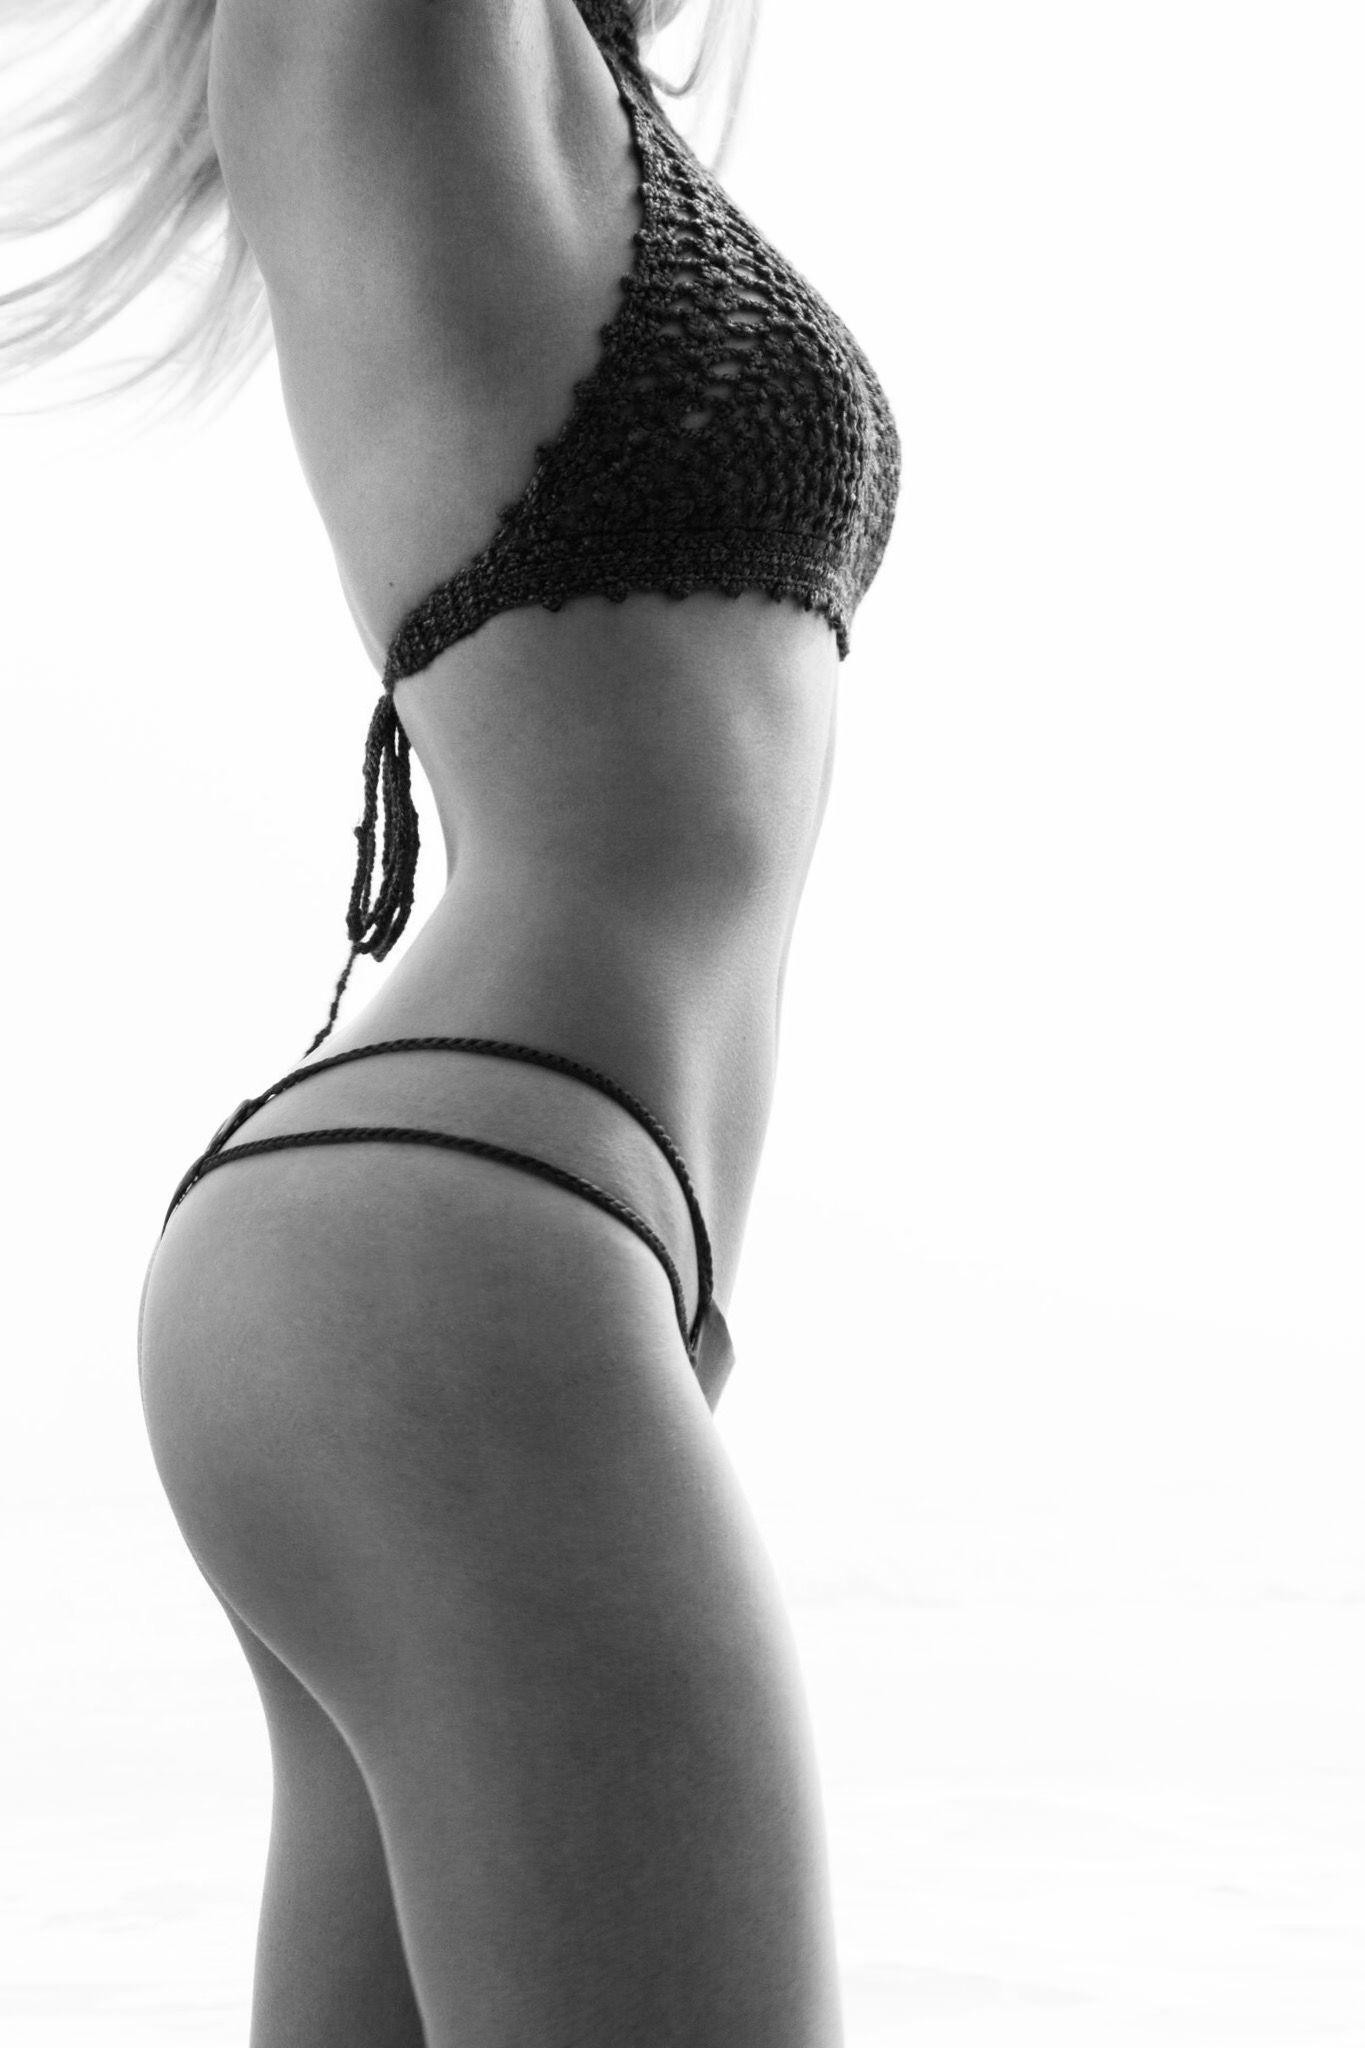 Bikini Photos of Ava Sambora